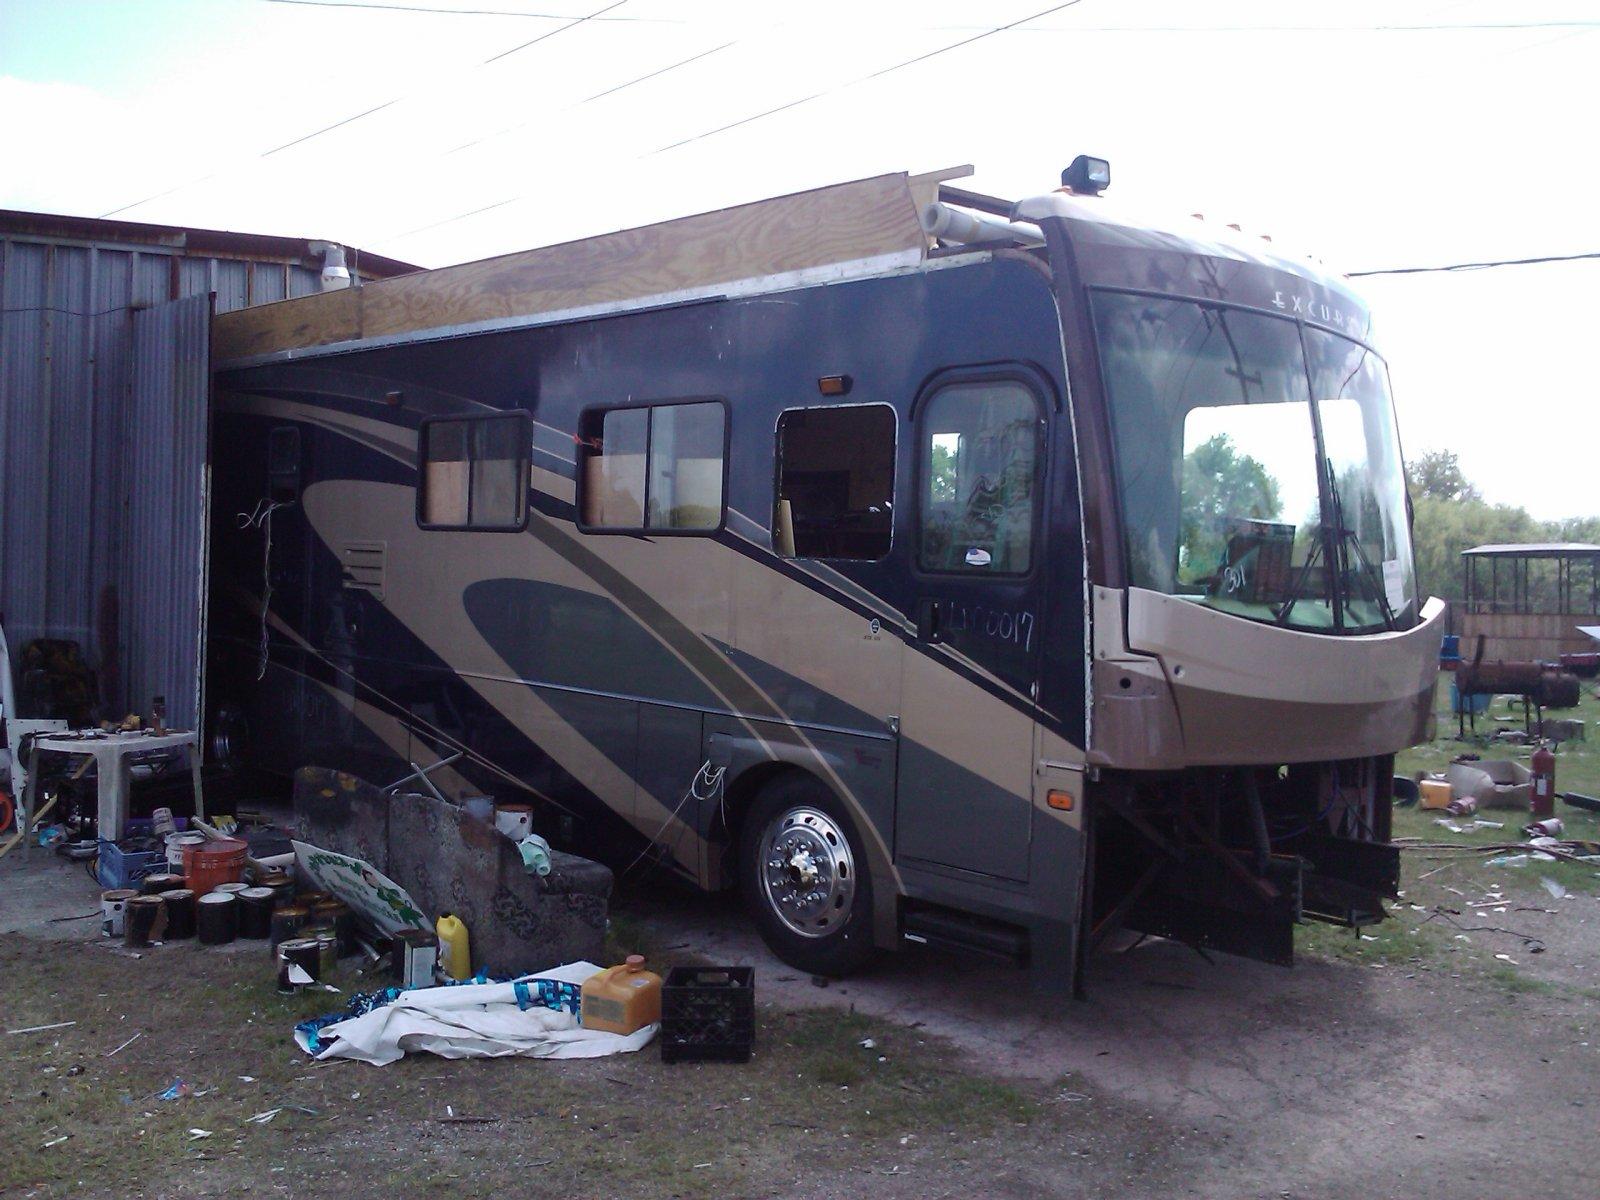 Click image for larger version  Name:2011-03-02 13.48.30_Lakeland_Florida_US.jpg Views:252 Size:267.3 KB ID:53046